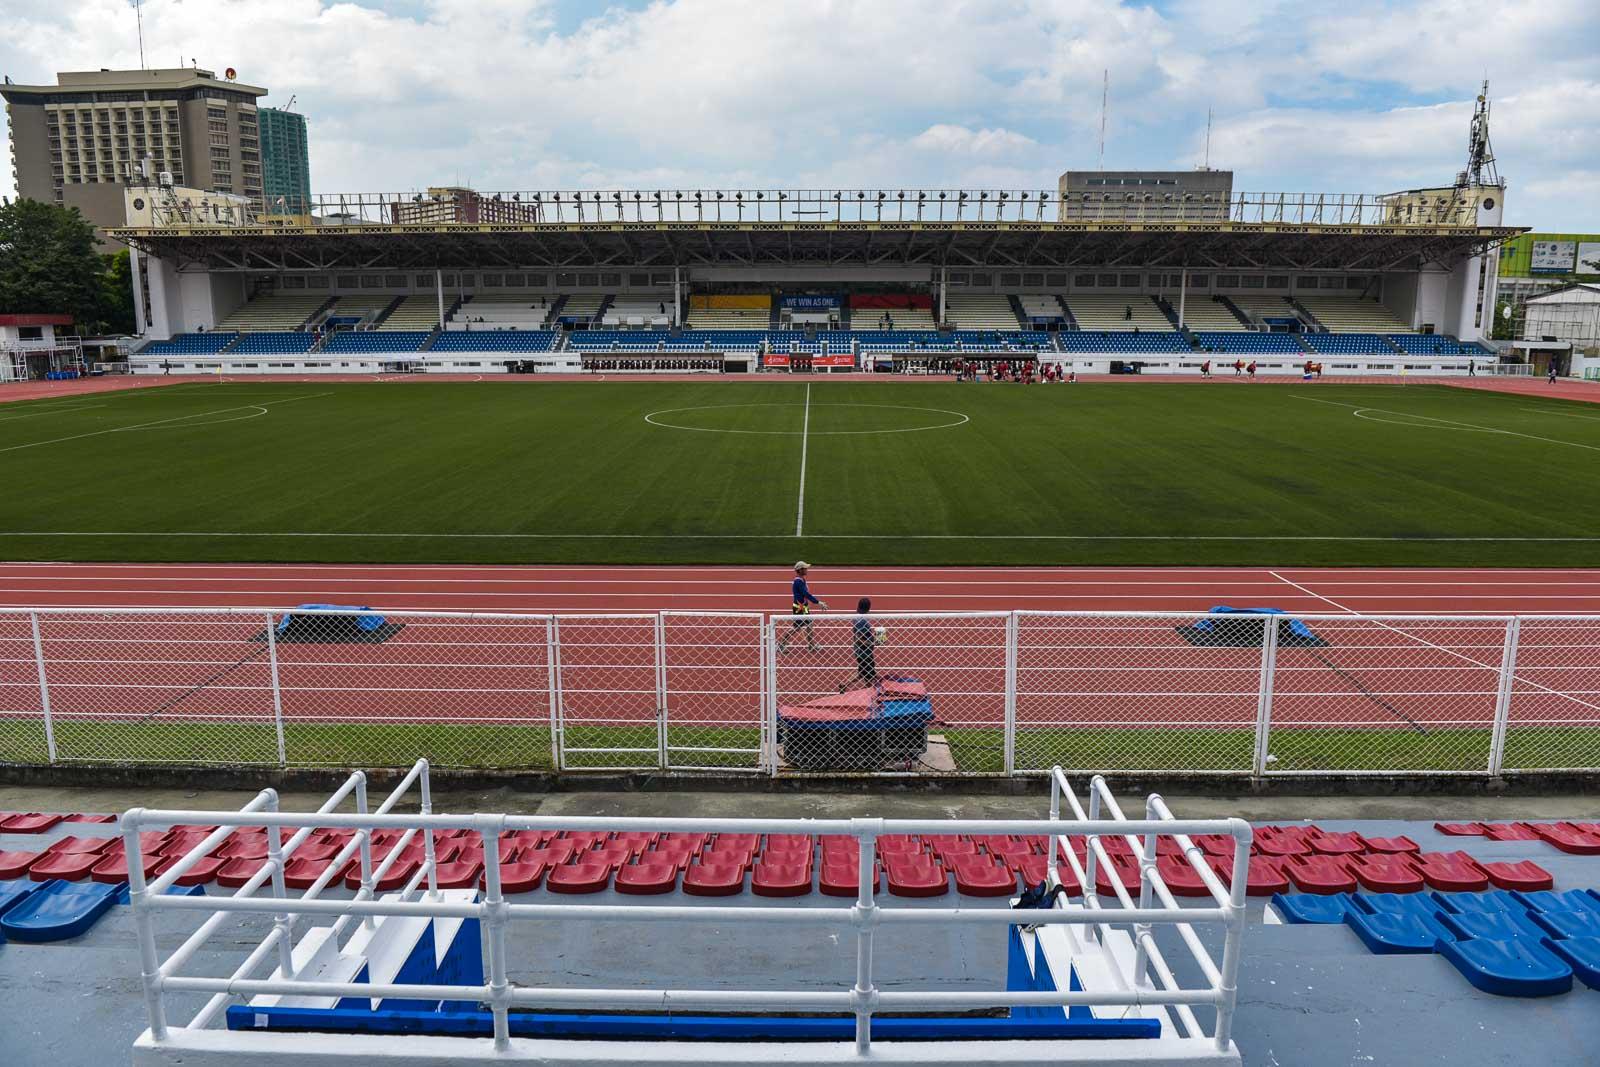 GOOD TO GO. The football field of the Rizal Memorial Stadium looks ready. Photo by LeAnne Jazul/Rappler